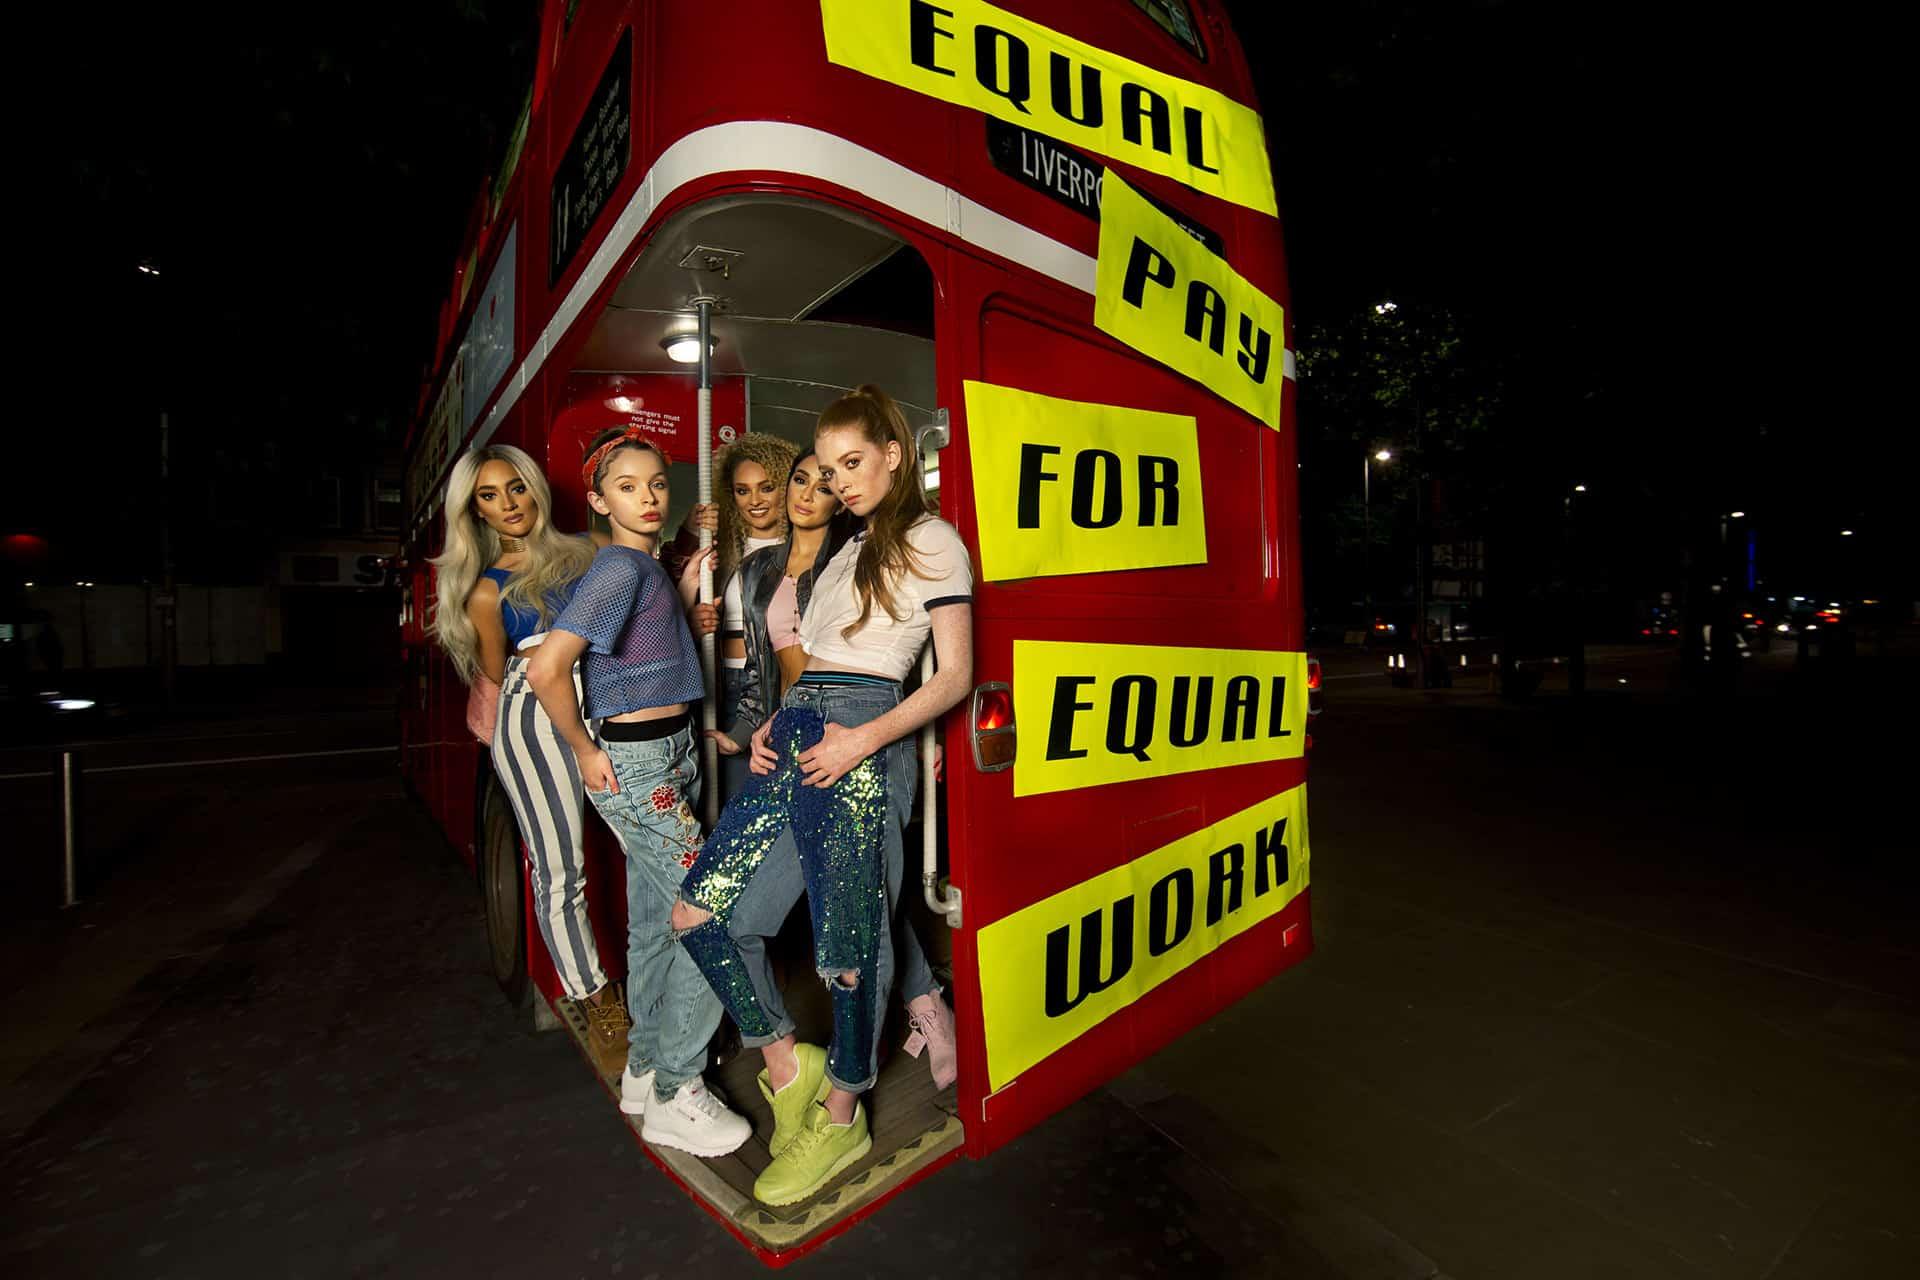 Global Girls – London, UK